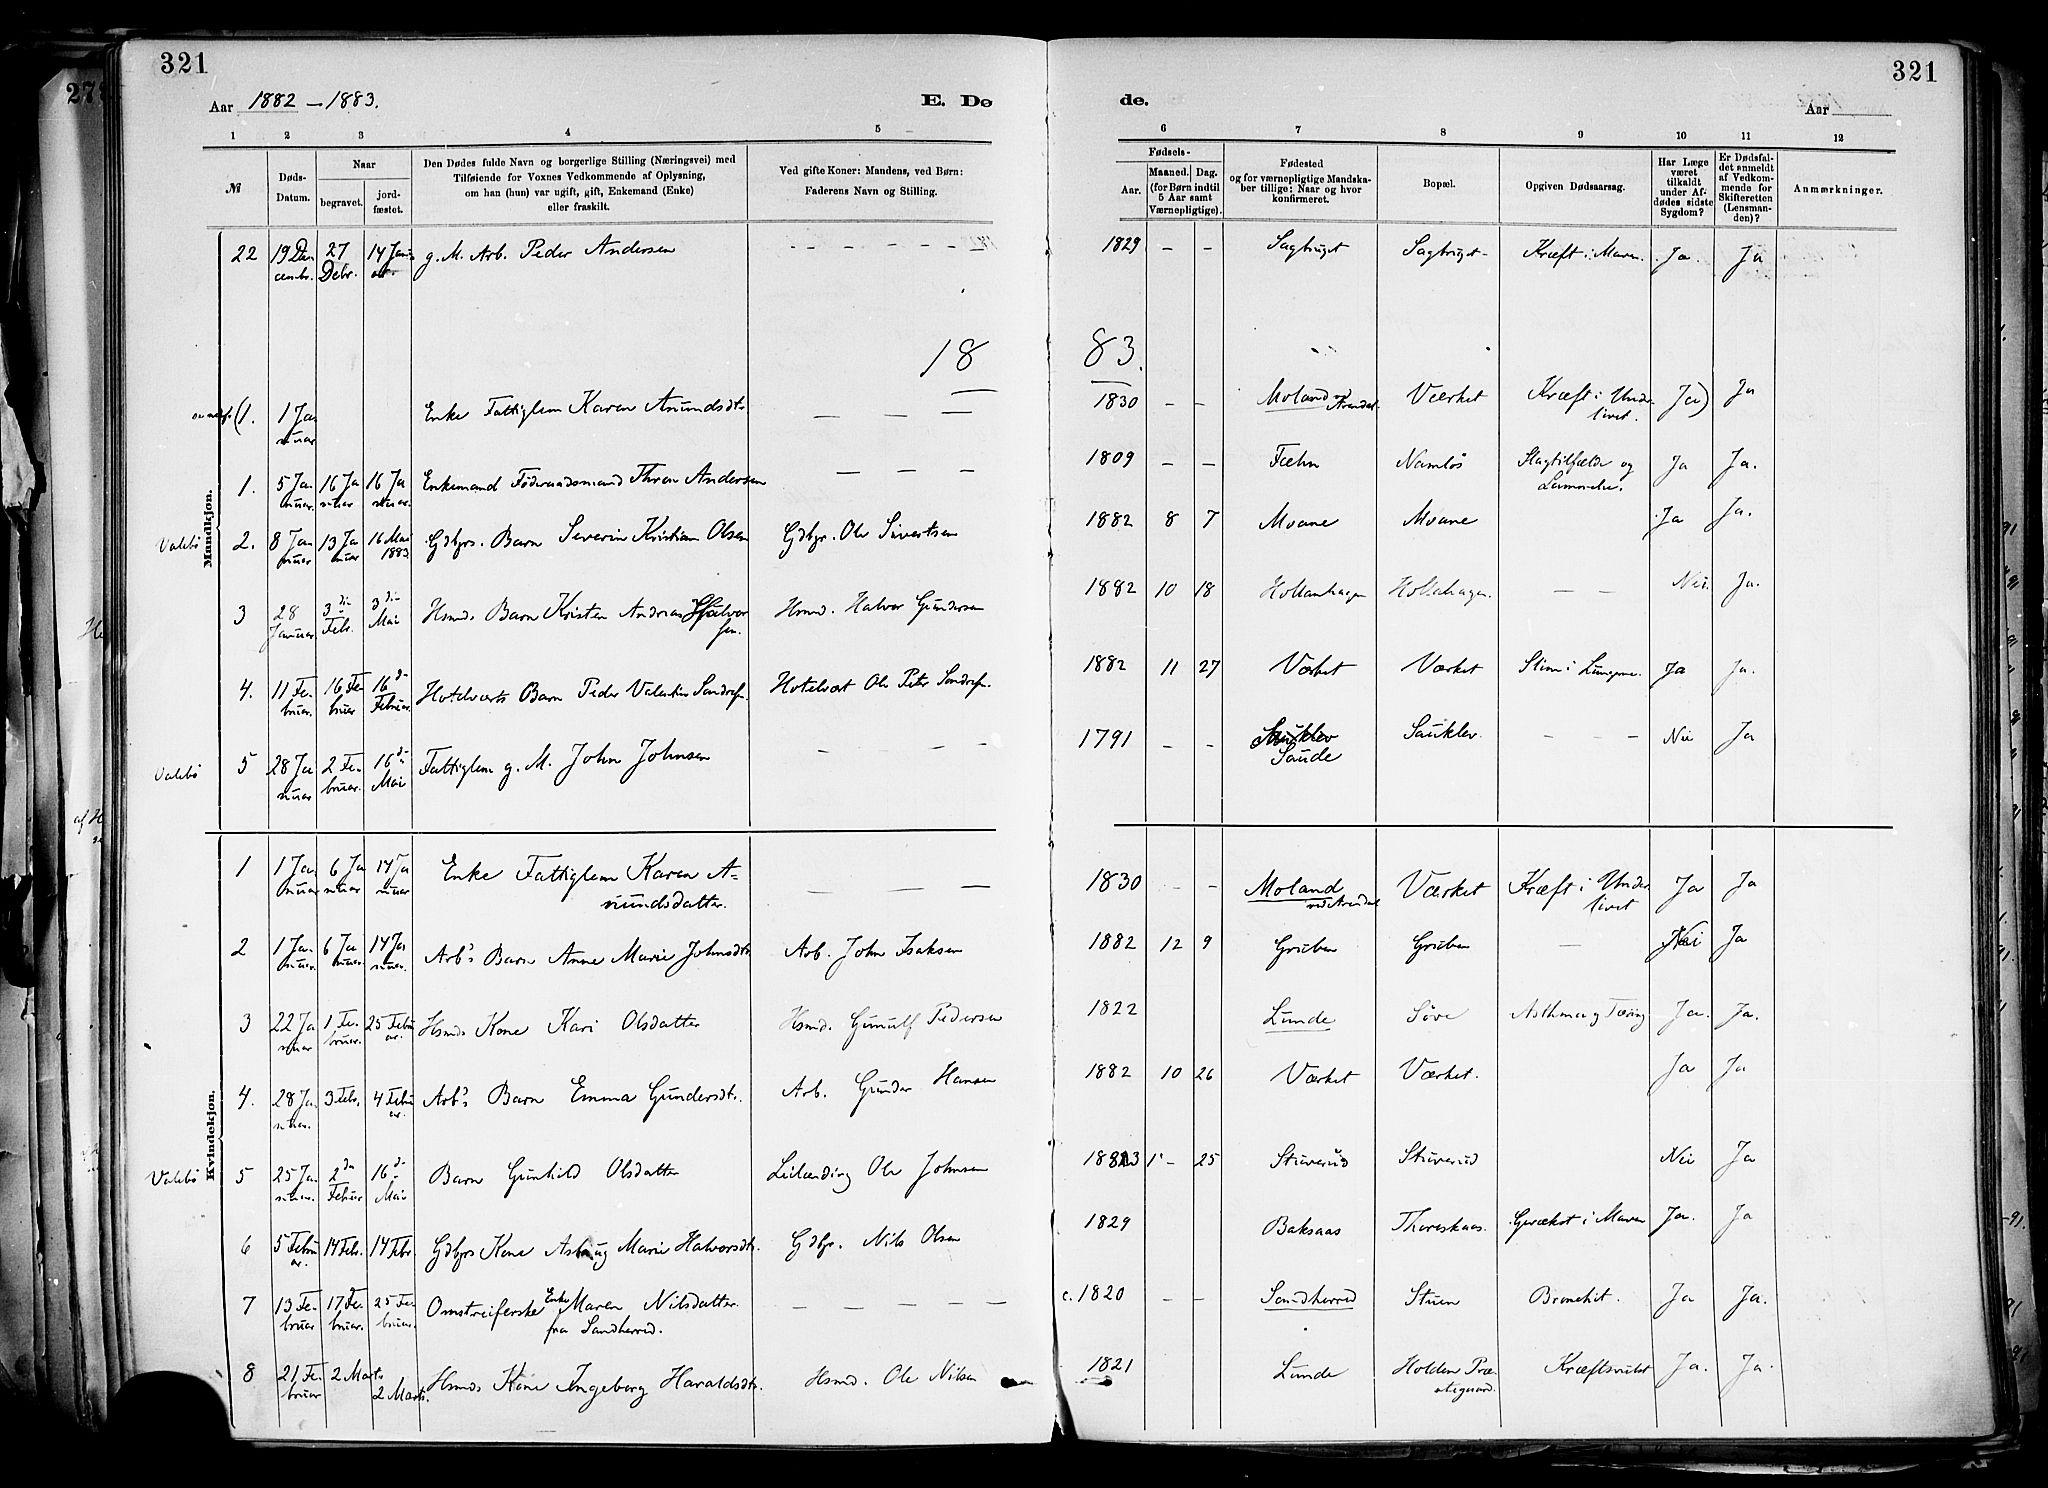 SAKO, Holla kirkebøker, F/Fa/L0008: Ministerialbok nr. 8, 1882-1897, s. 321